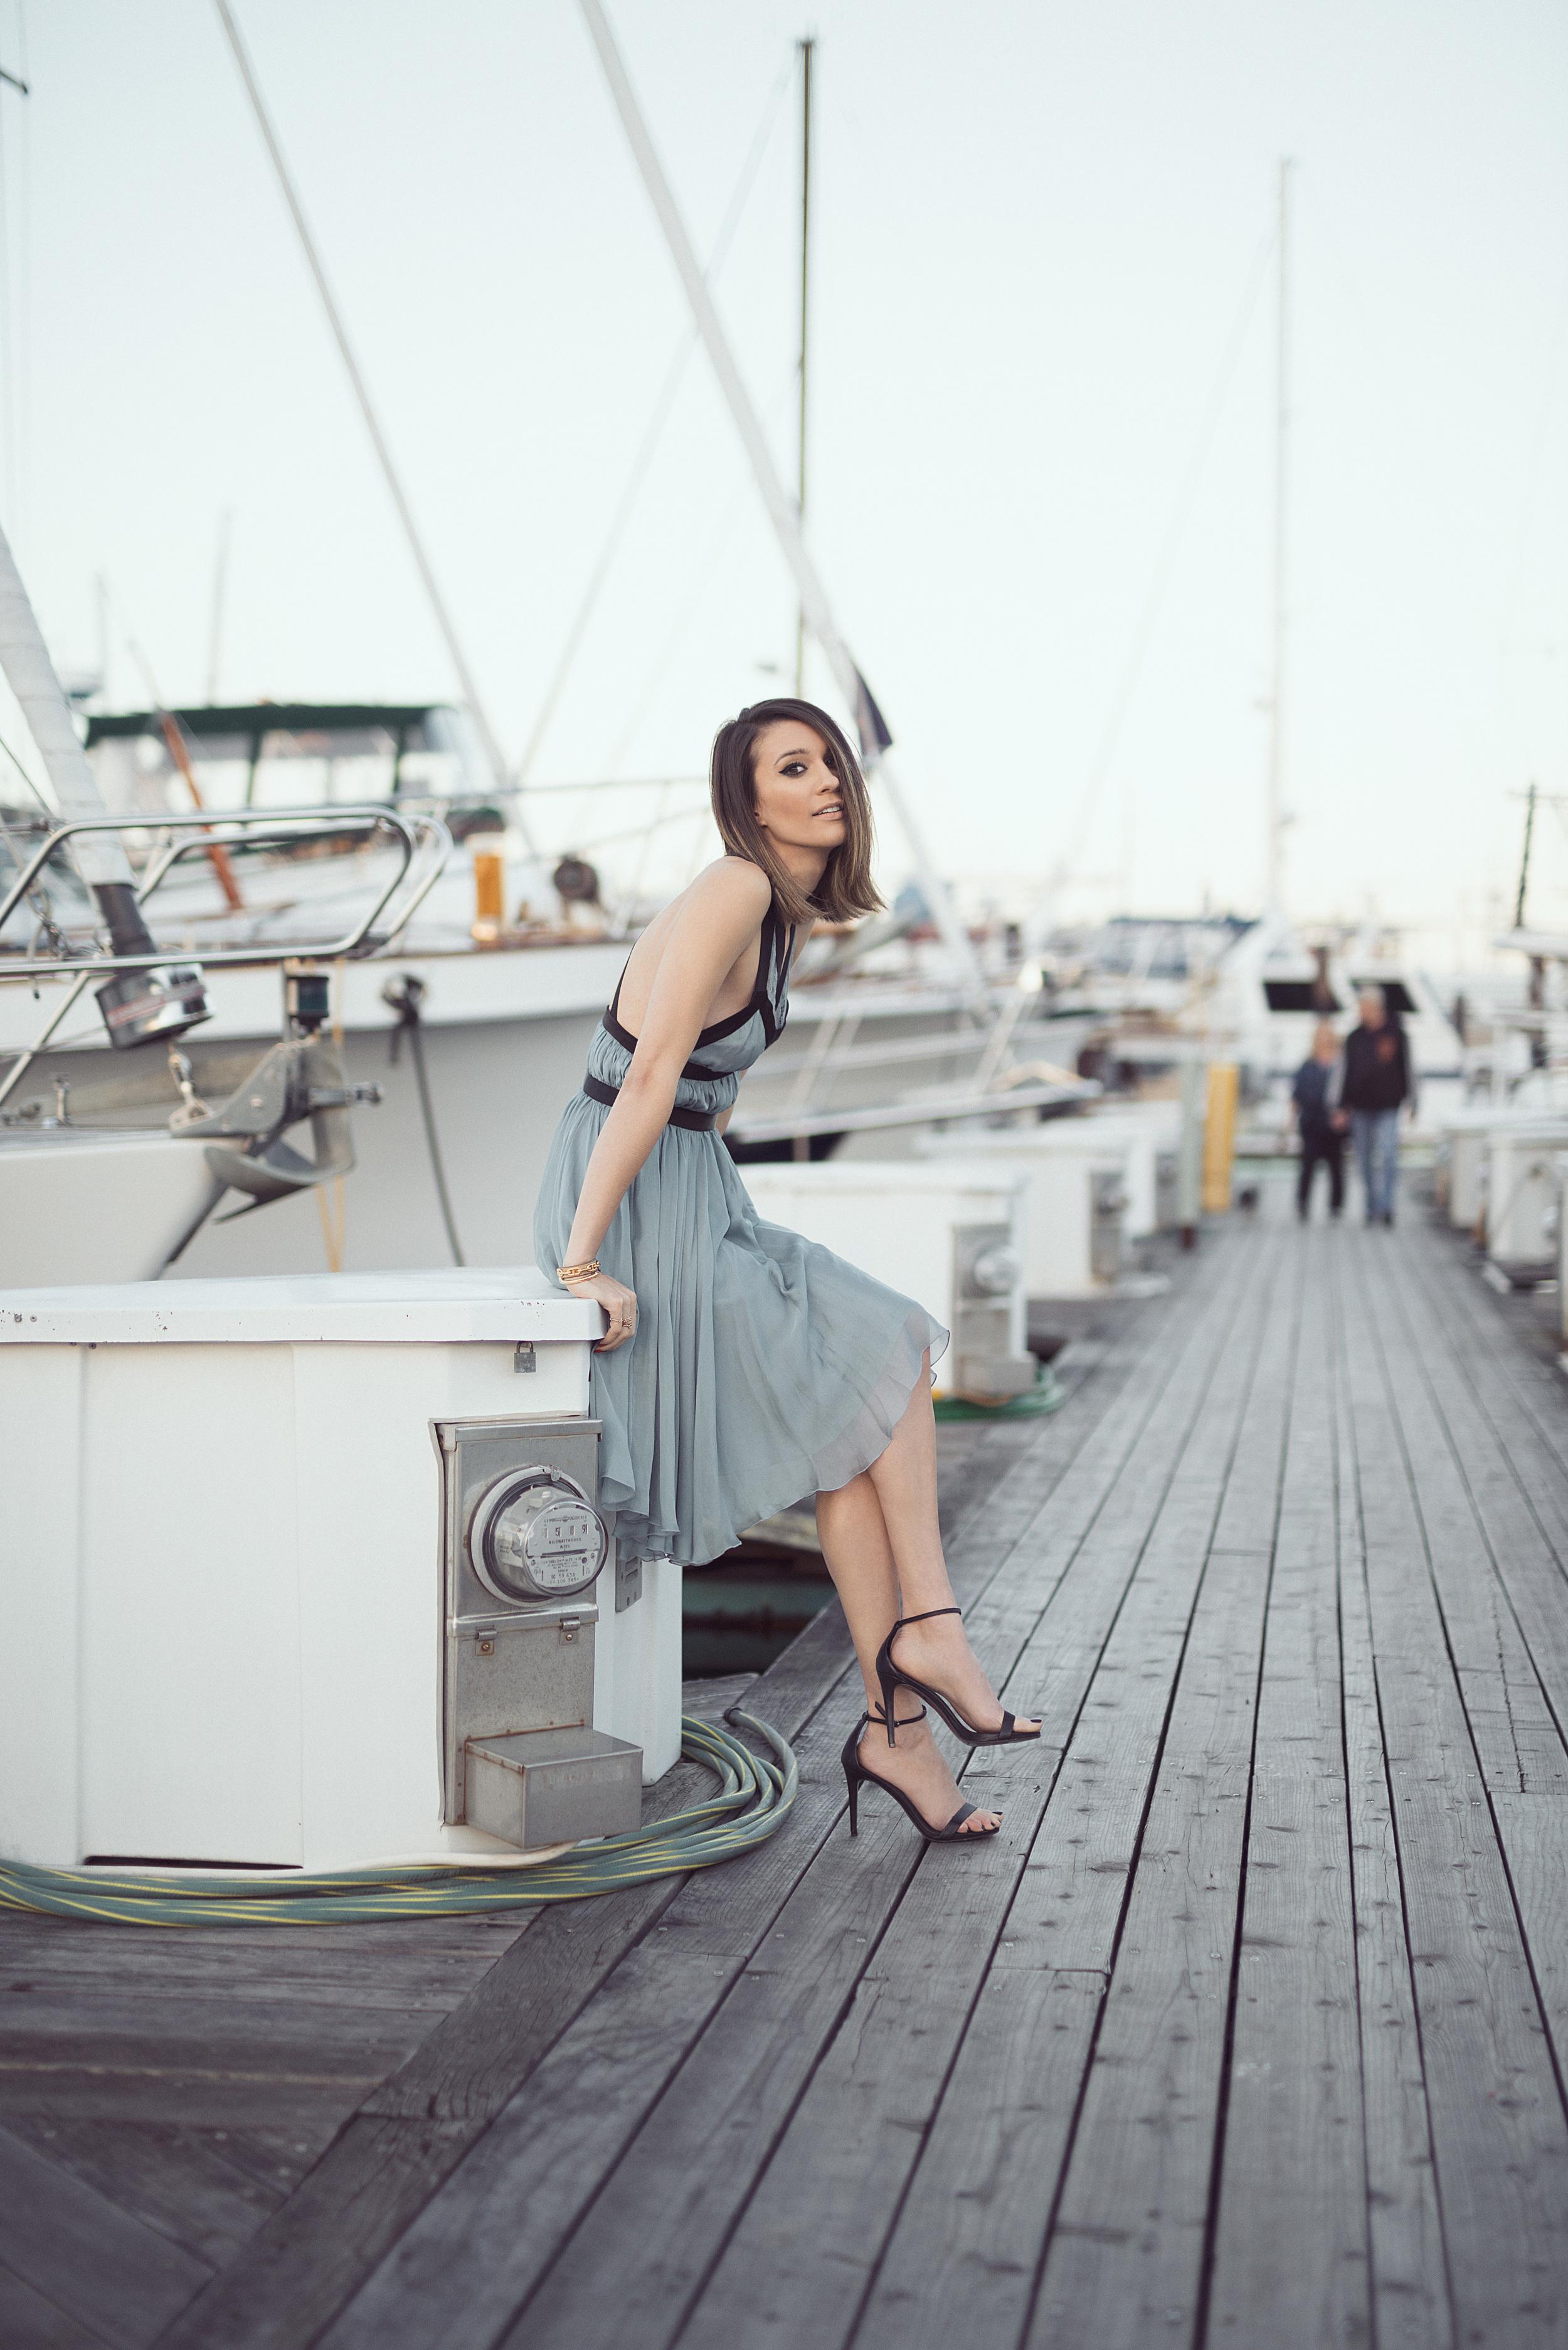 blue_dress_travel_blogger_elise_gabriel_sausalito